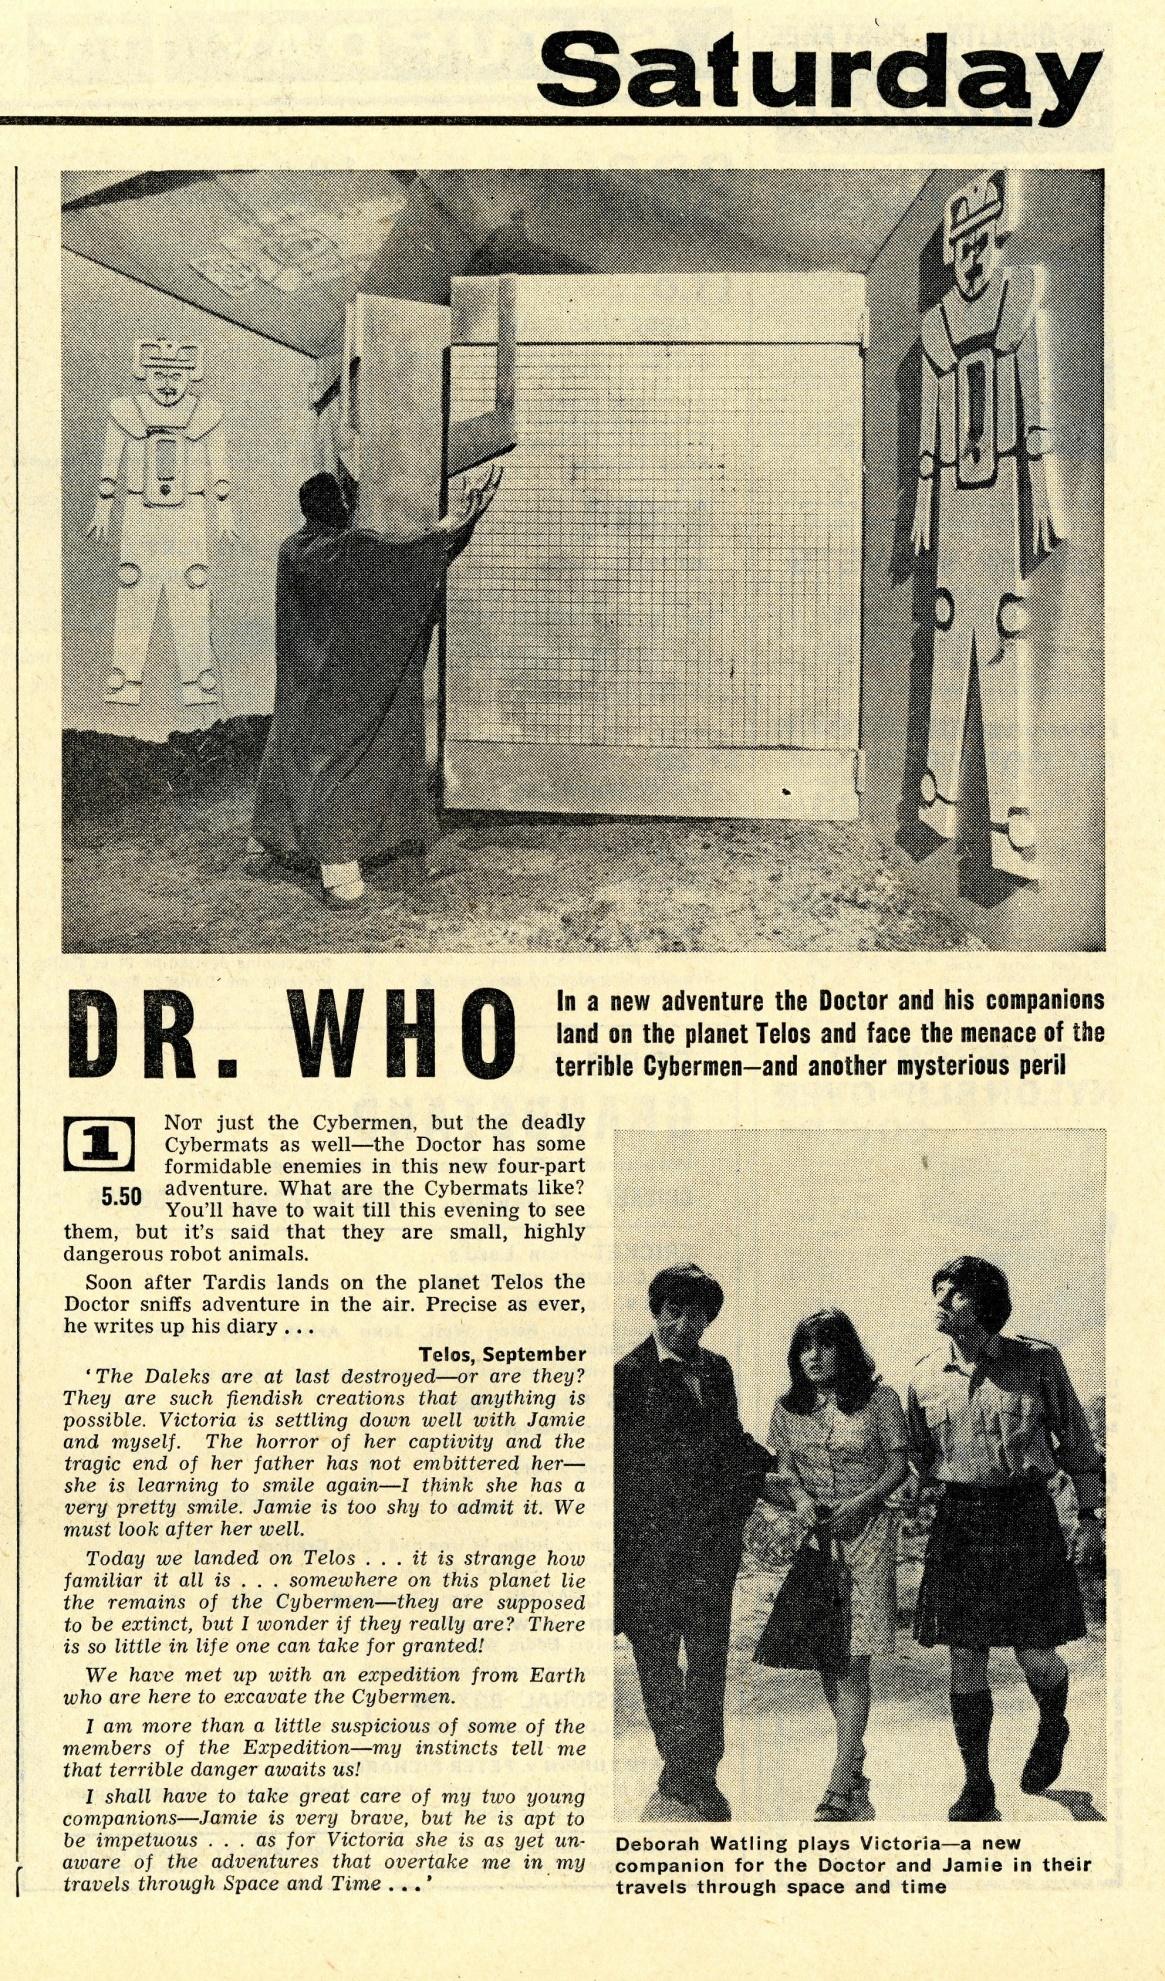 Radio Times 2-8 September 1967